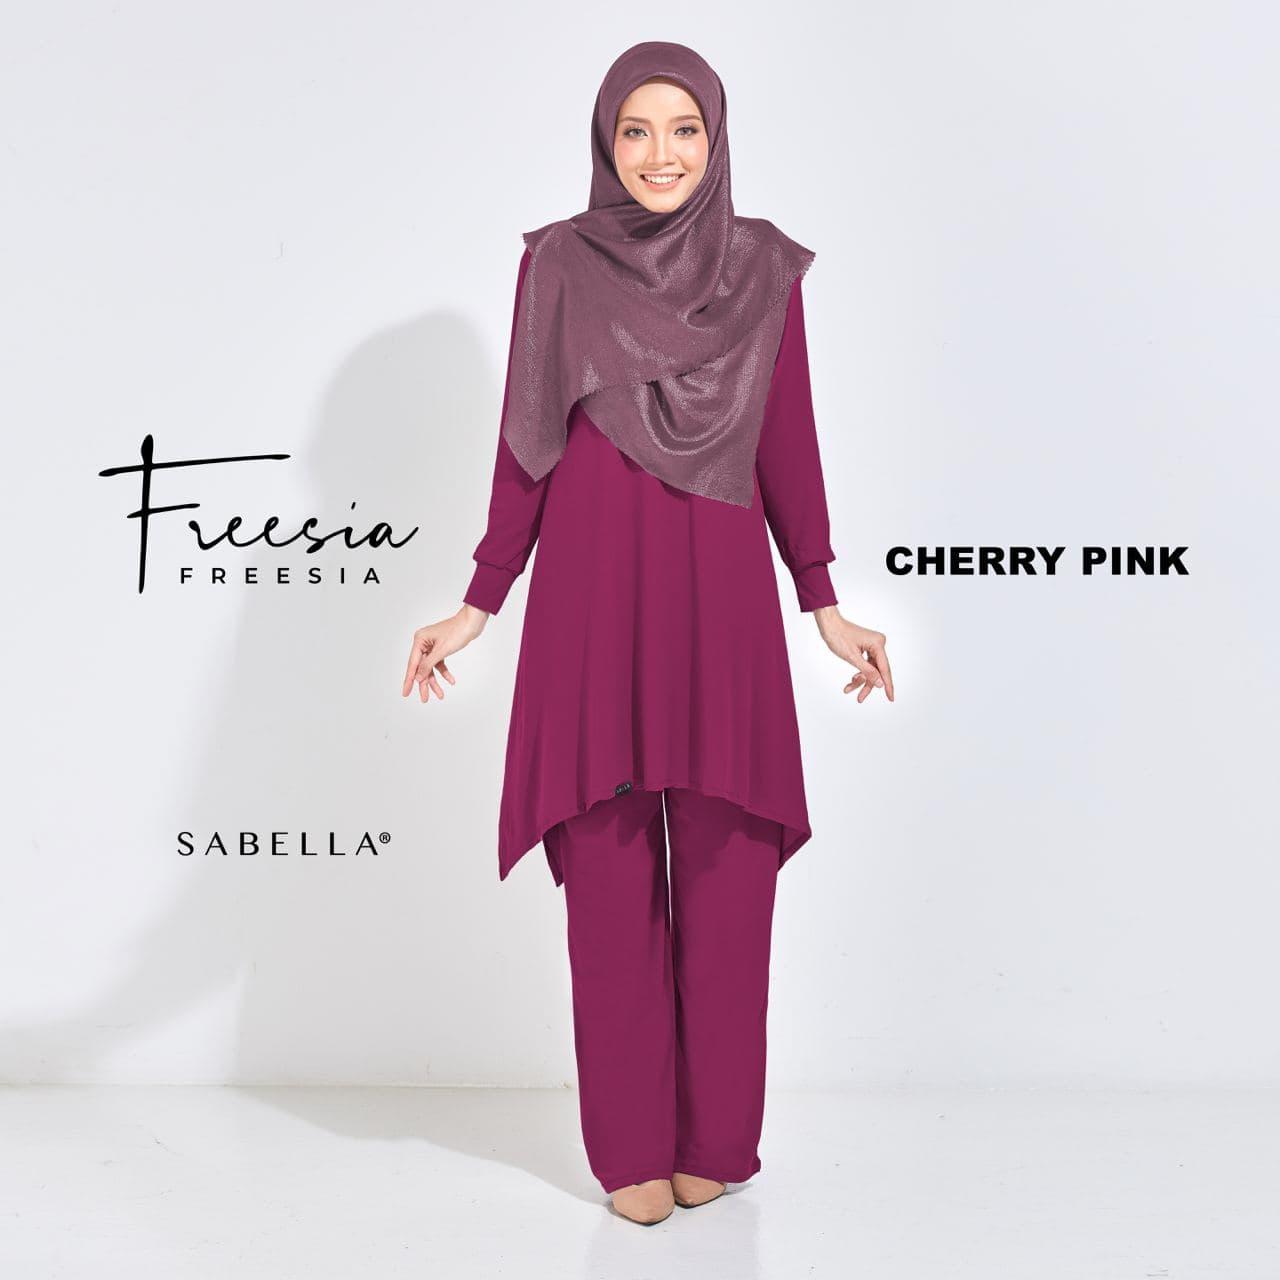 Freesia Cherry pink (R)